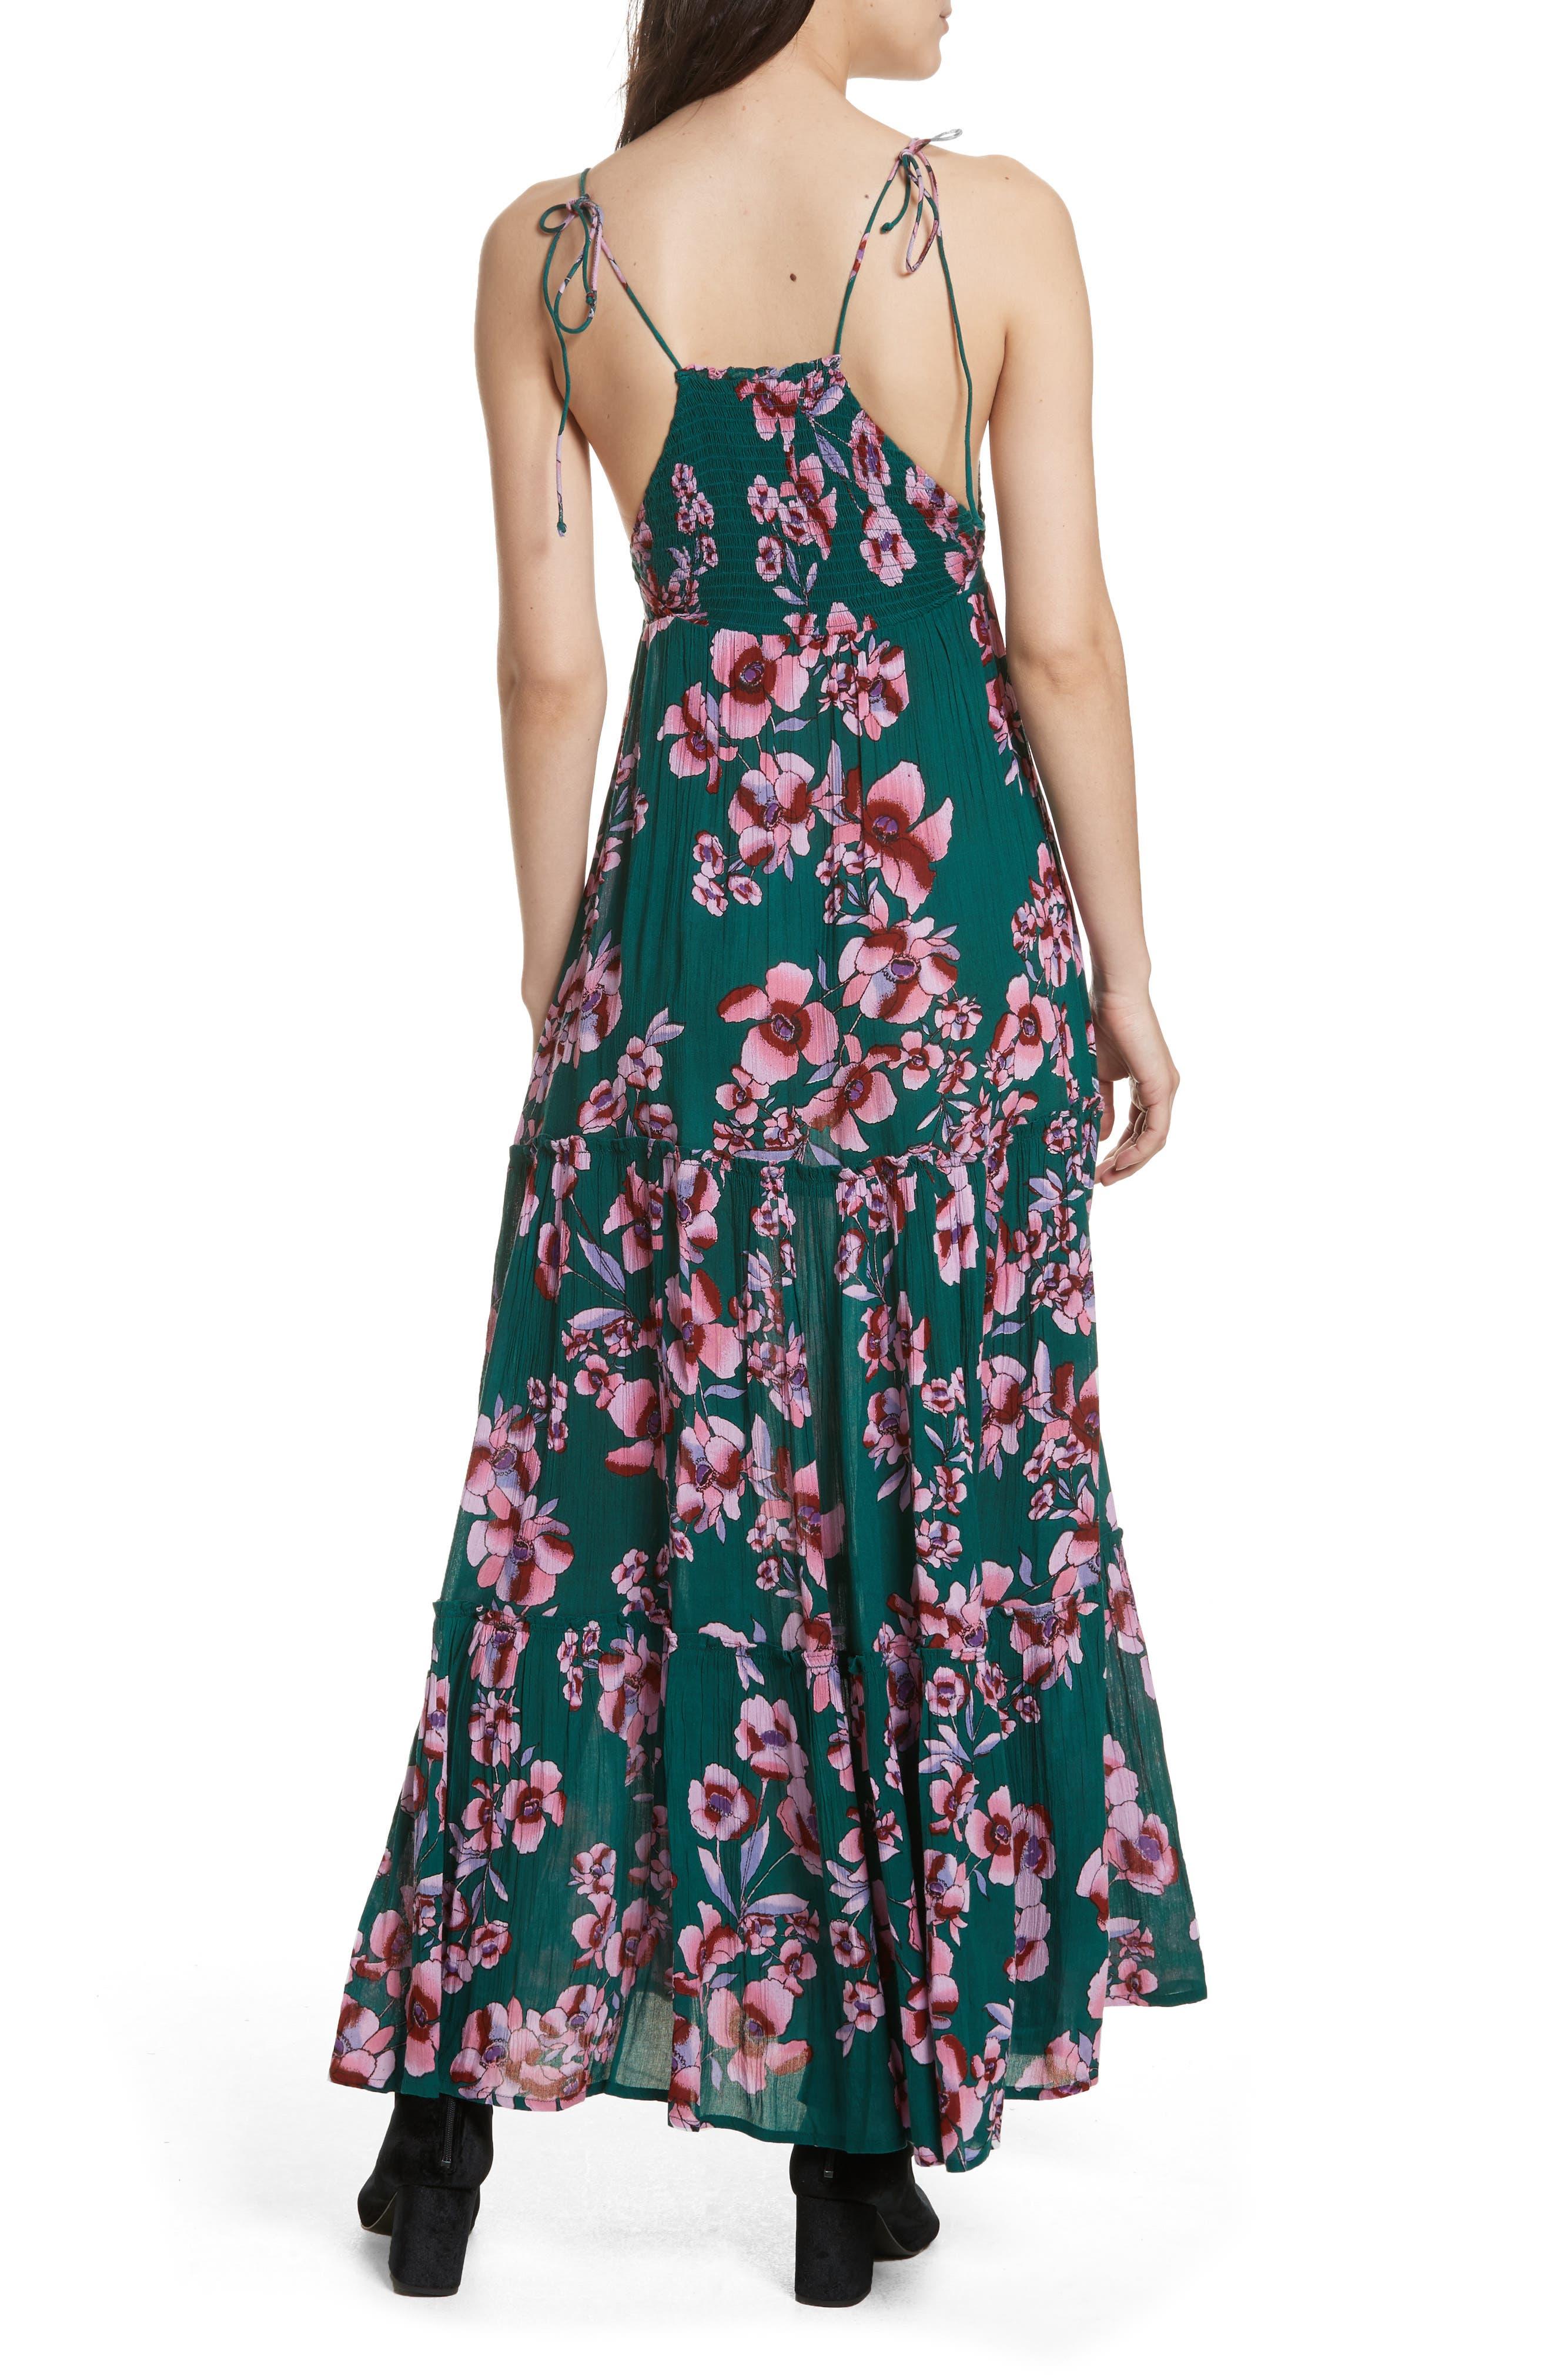 Garden Party Maxi Dress,                             Alternate thumbnail 2, color,                             Turquoise